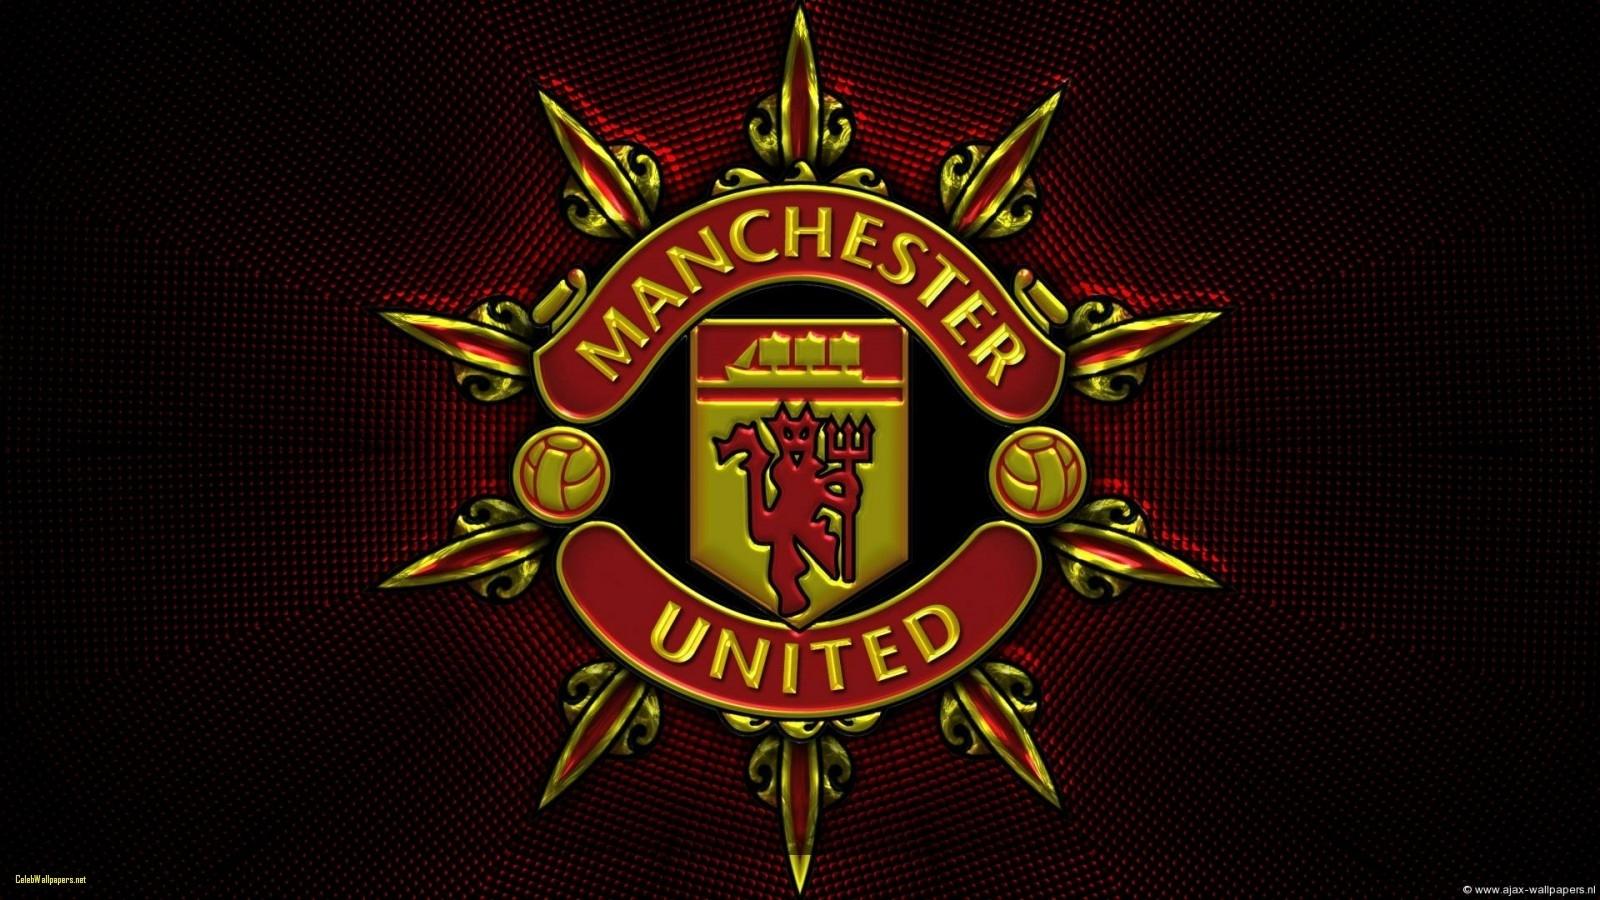 manchester united logo wallpapers hd wallpaper cave best of man utd